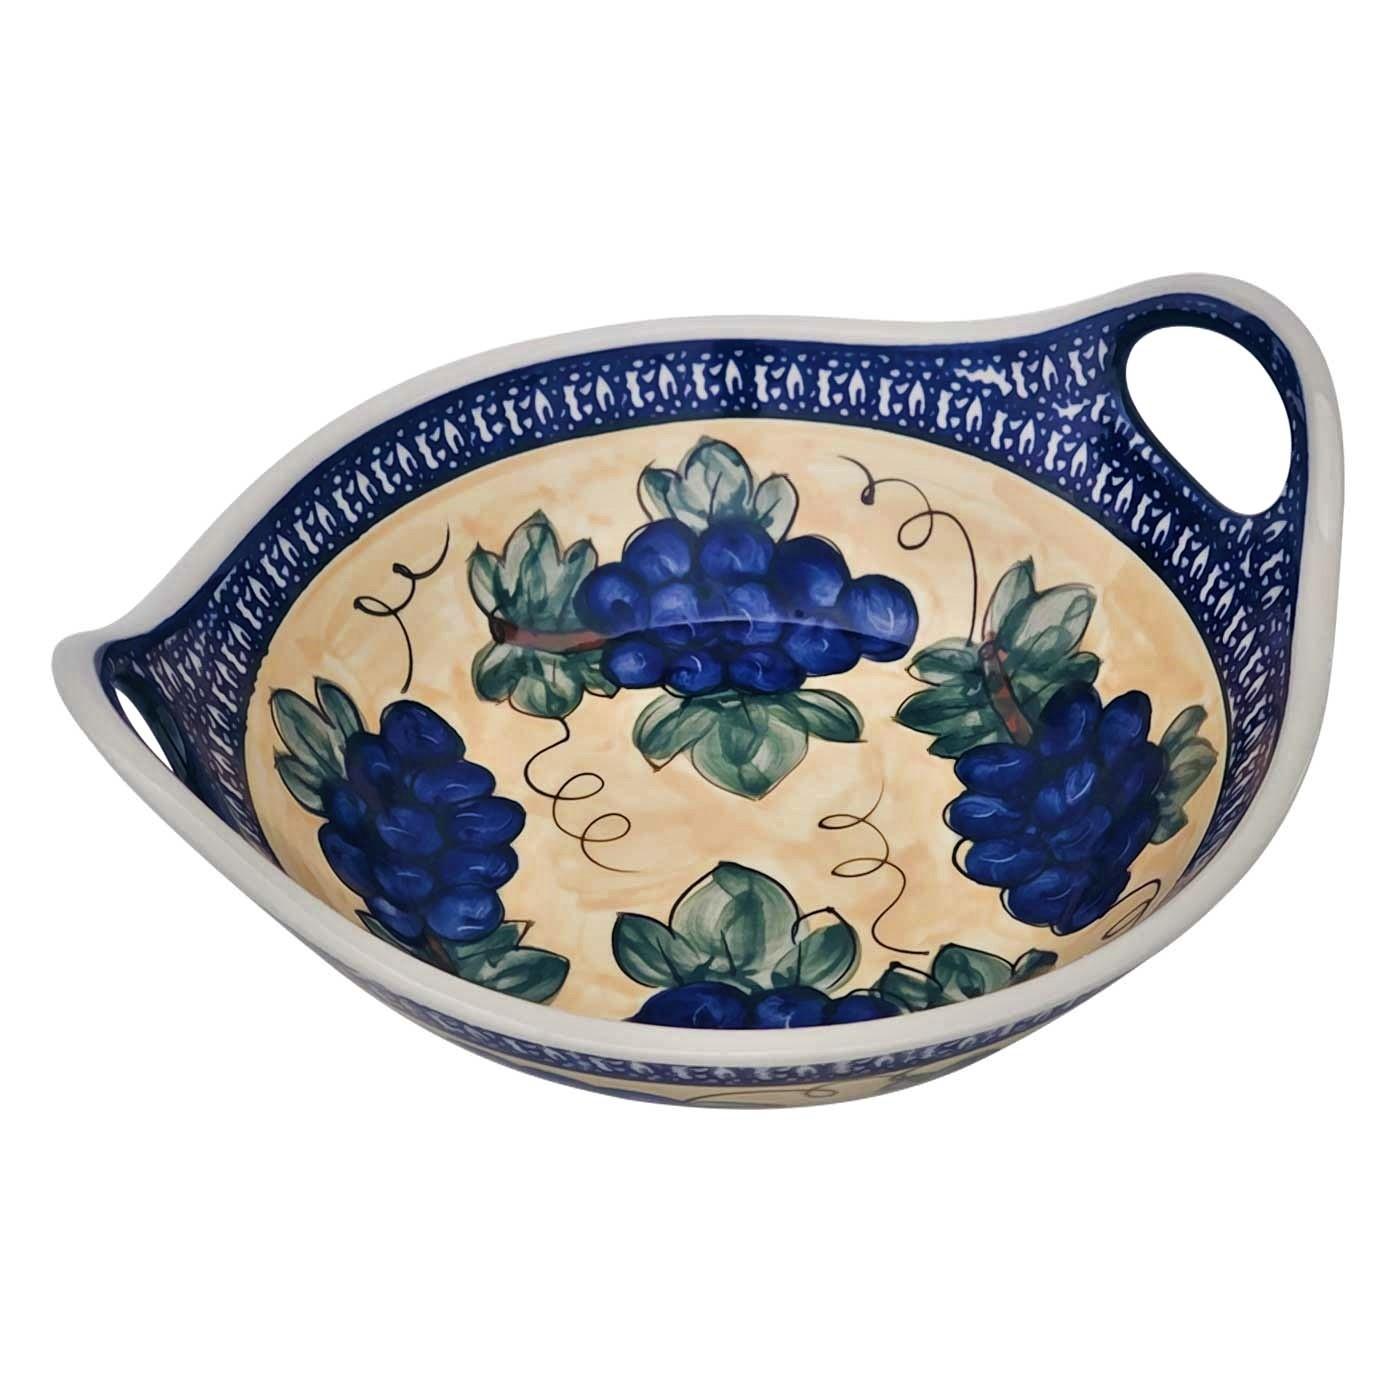 "Pottery Avenue Grapes 13"" Handled Stoneware Bowl"